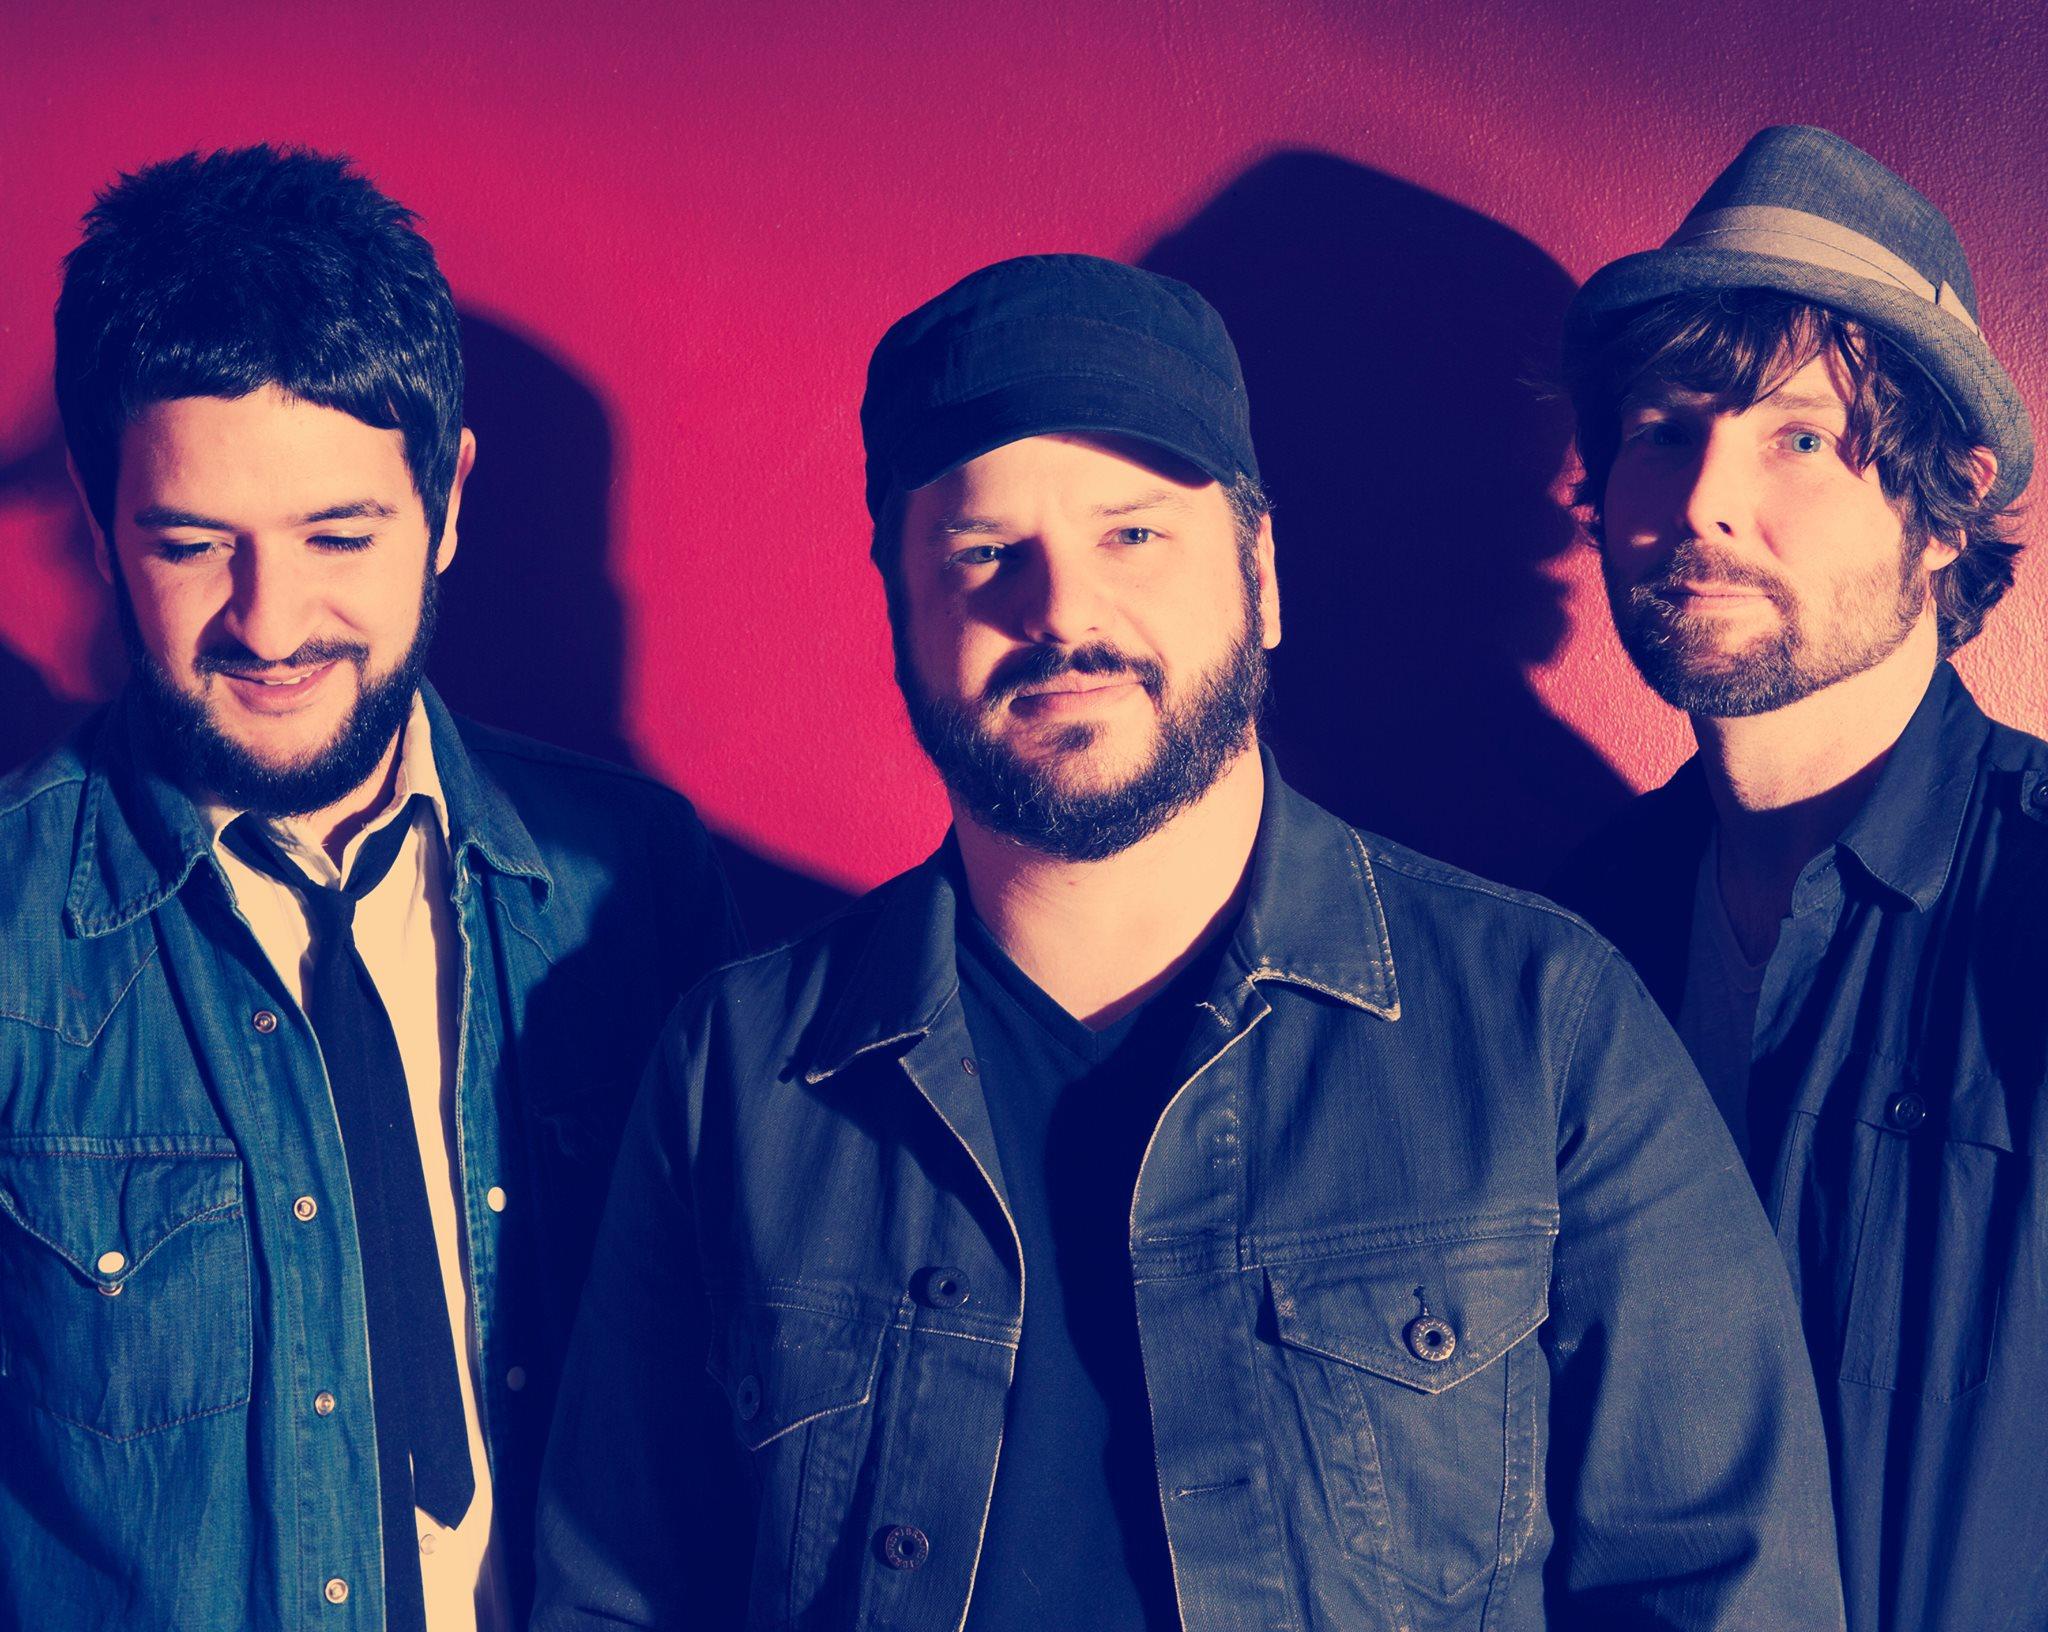 Live @ 5: The Record Company – 10/17/16